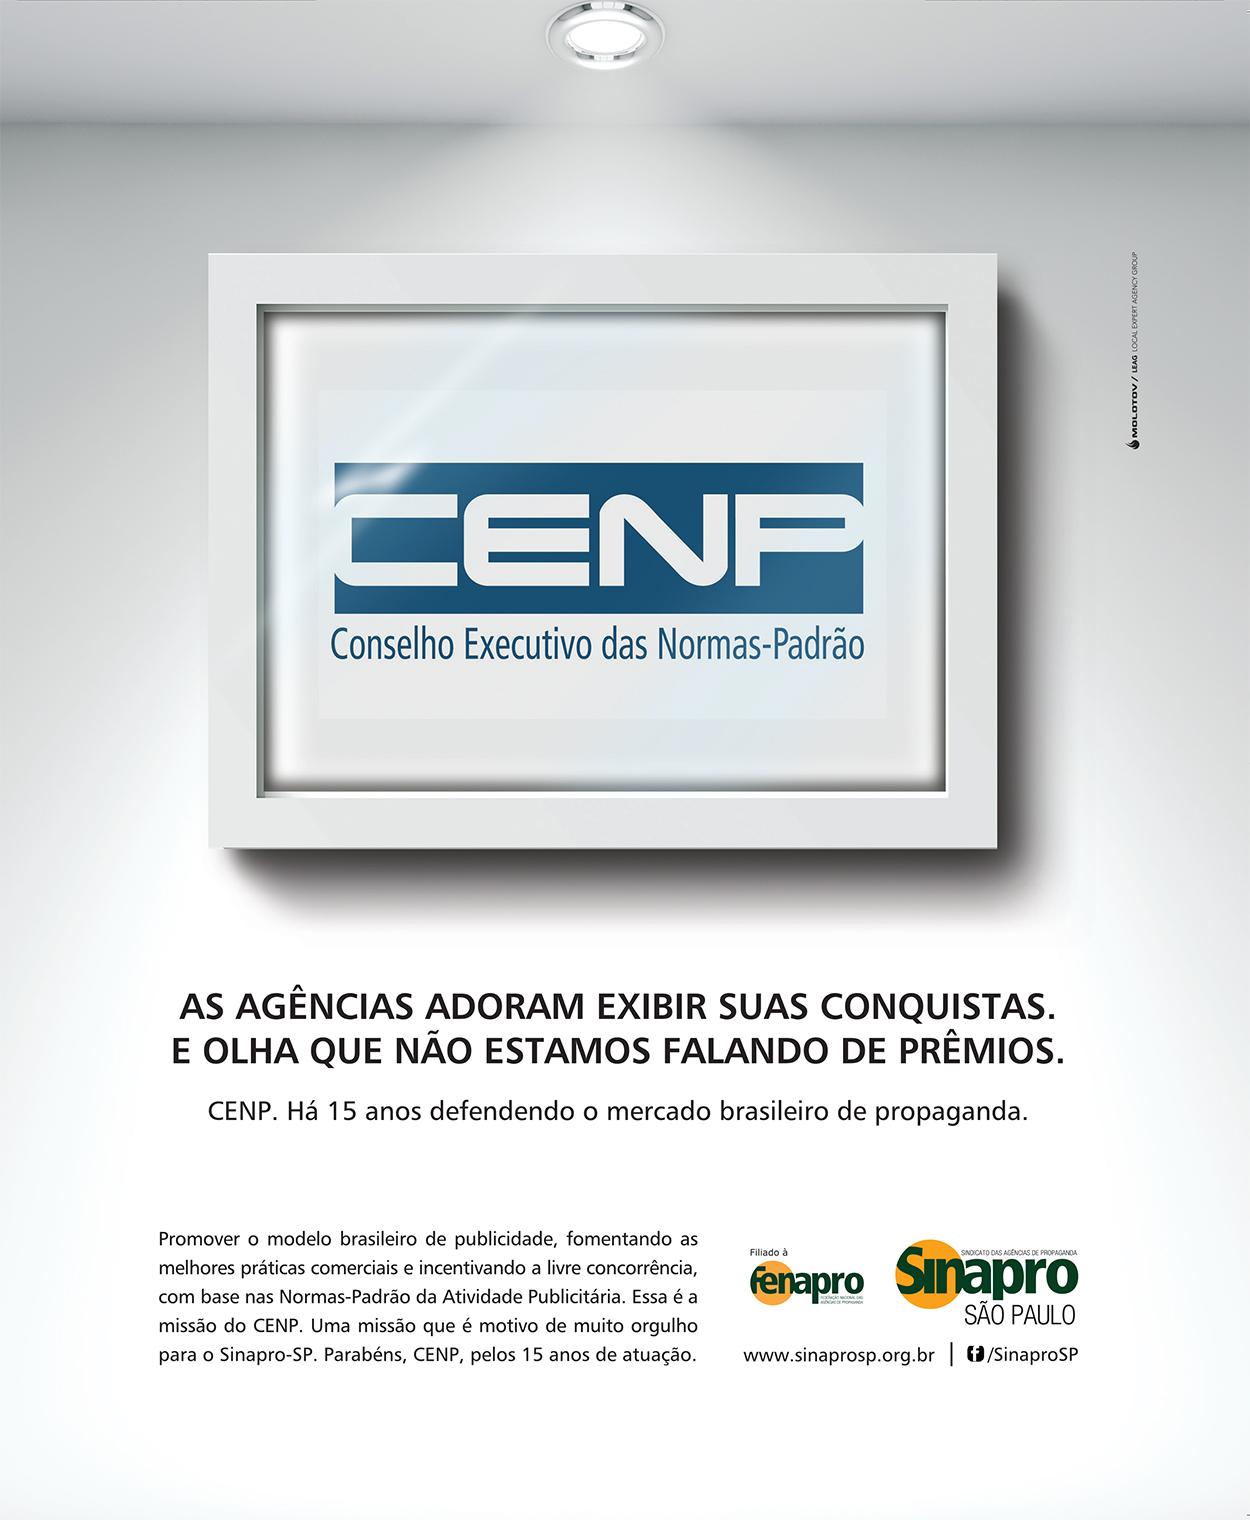 anuncio CENP.indd